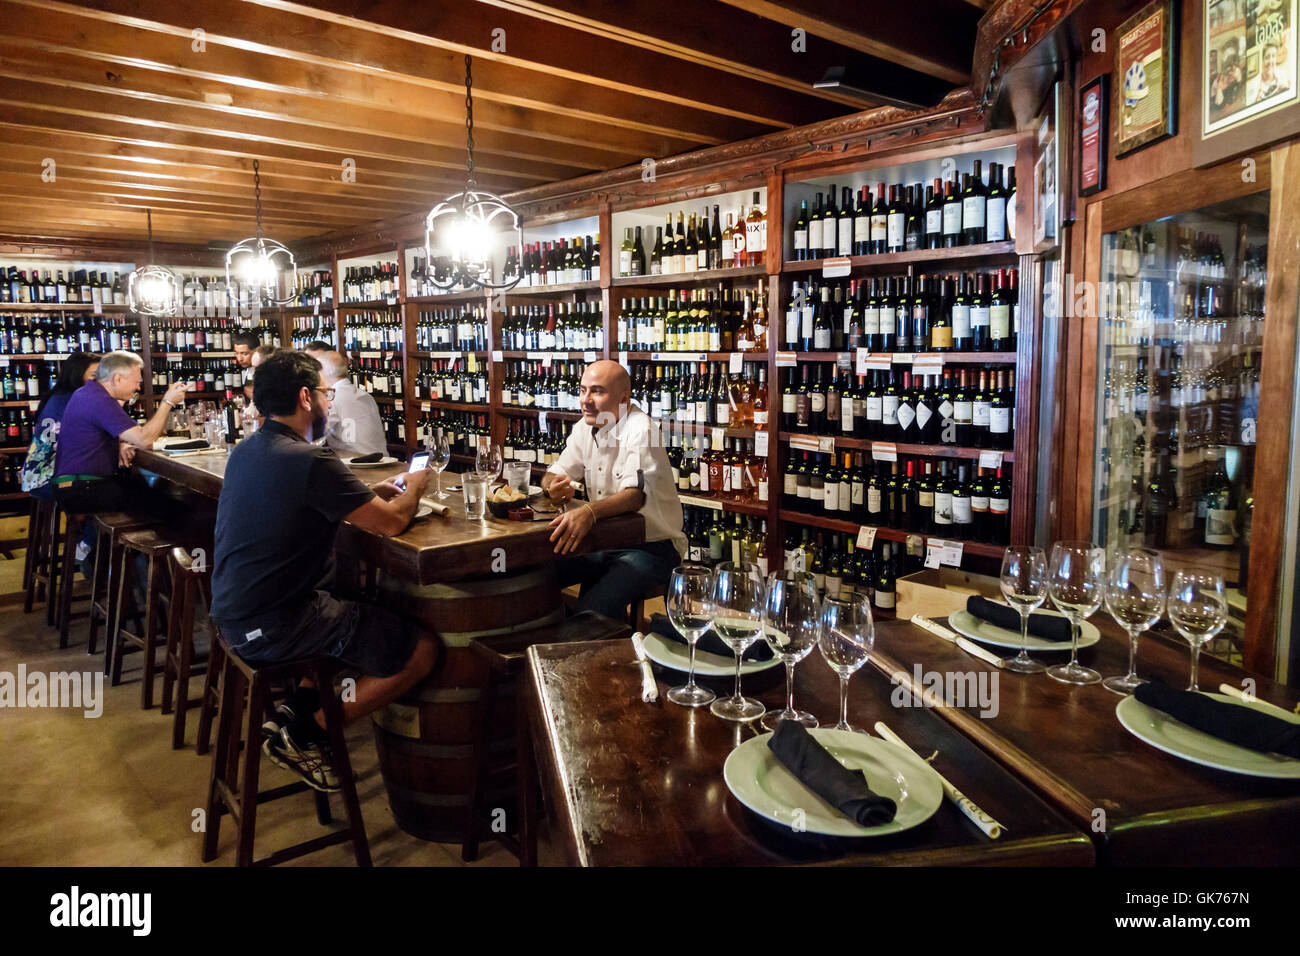 Miami florida el carajo wine bar de tapas restaurante - Decorar un bar de tapas ...